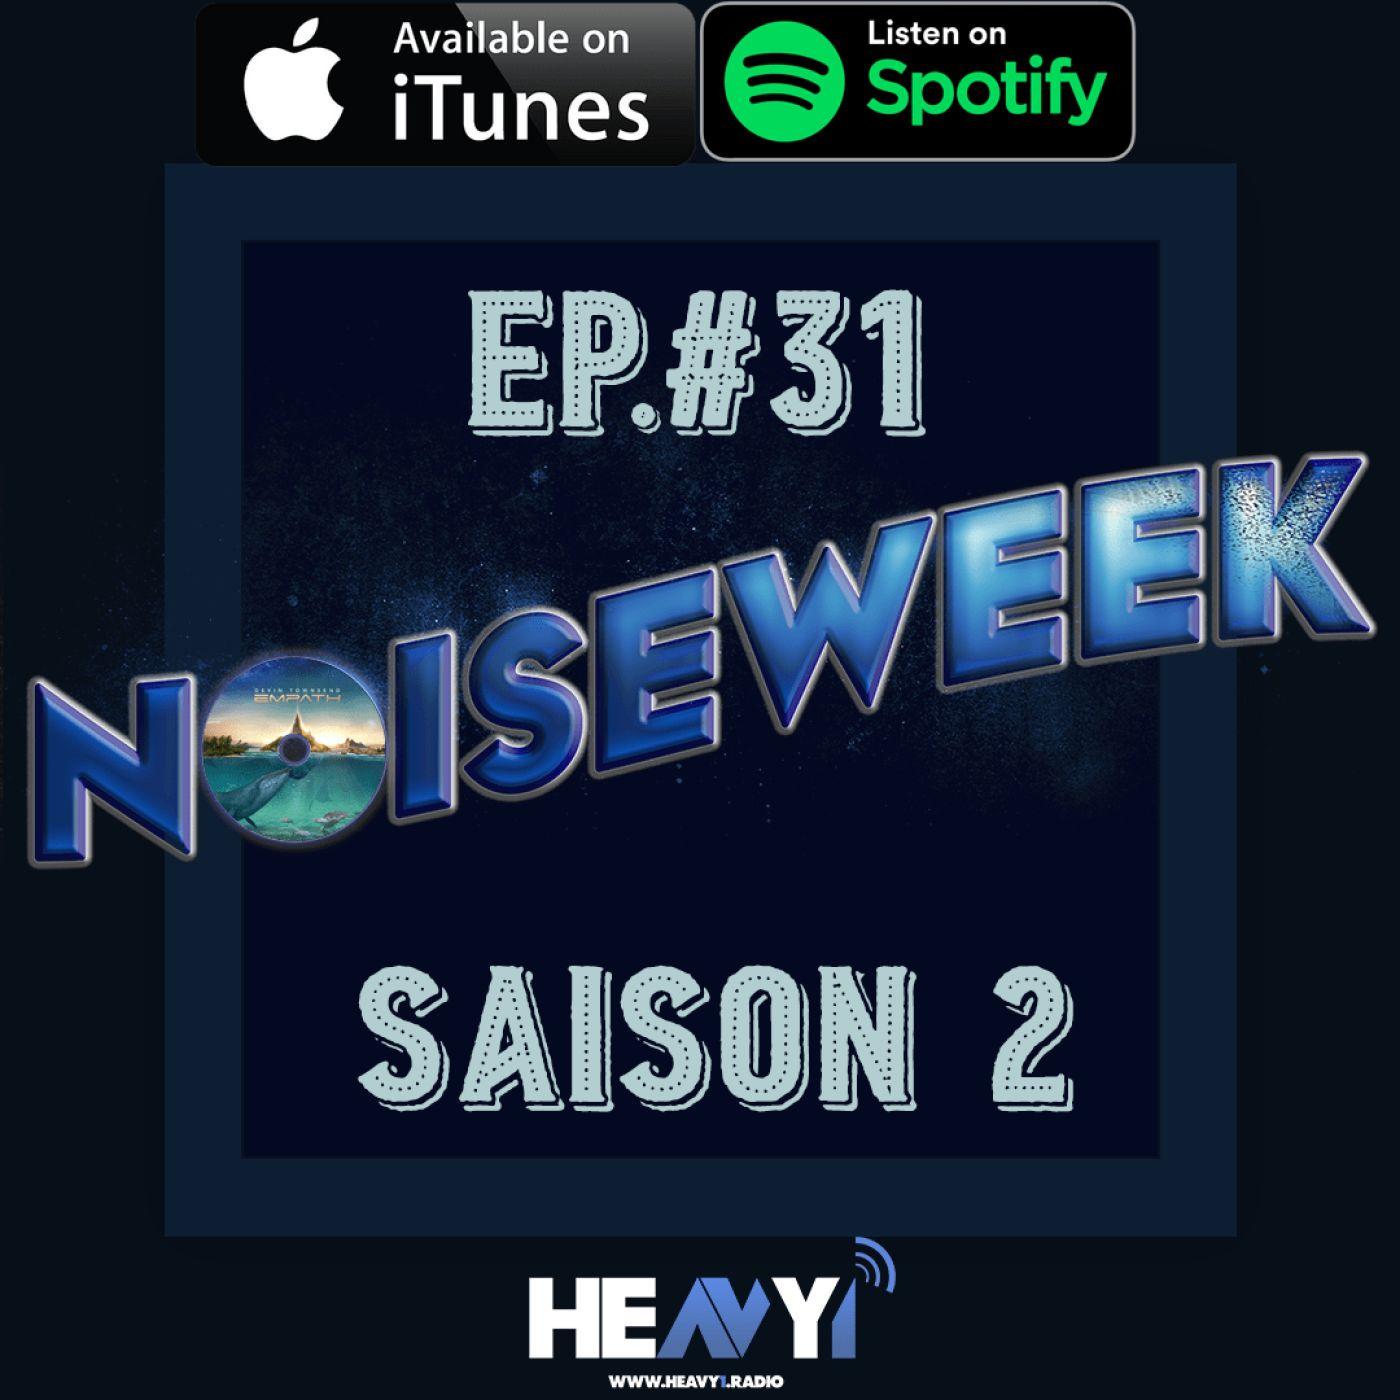 Noiseweek #31 Saison 2